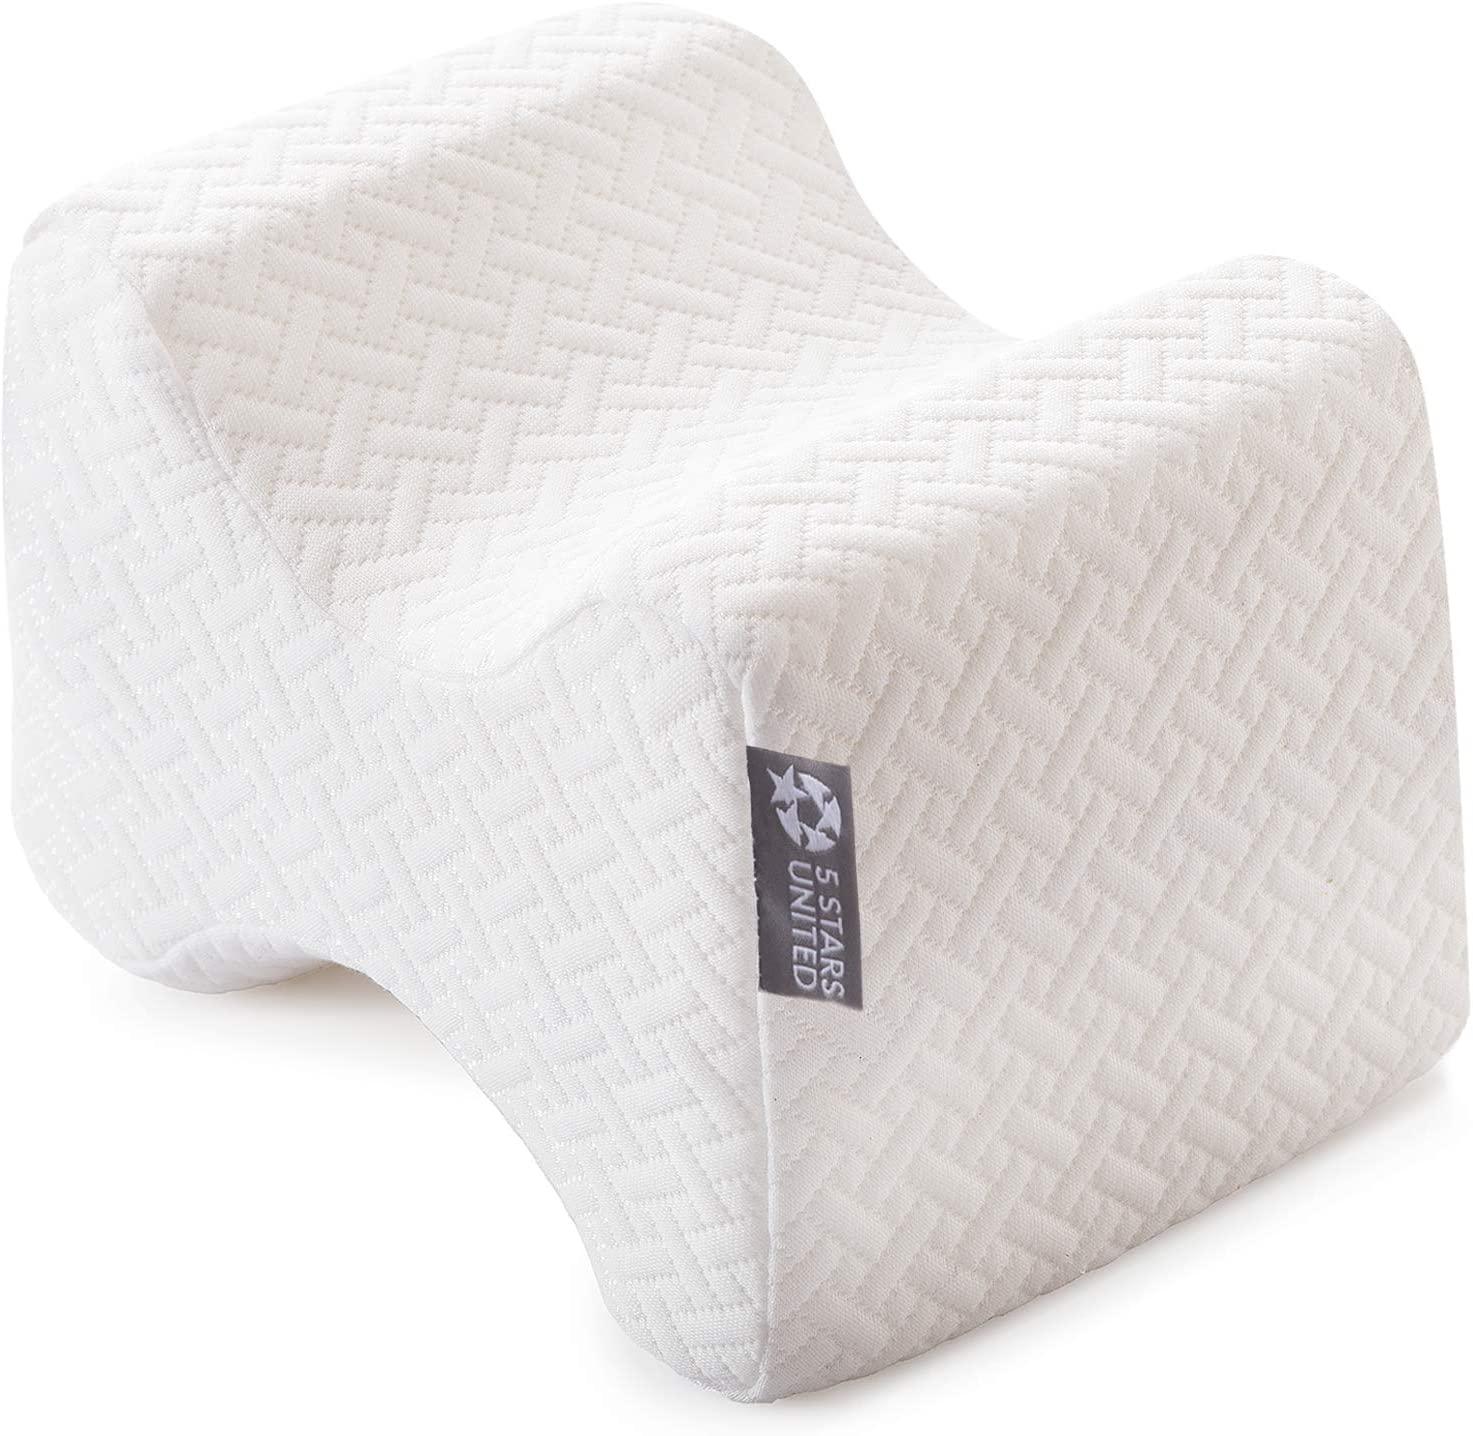 5 Star United Pillow